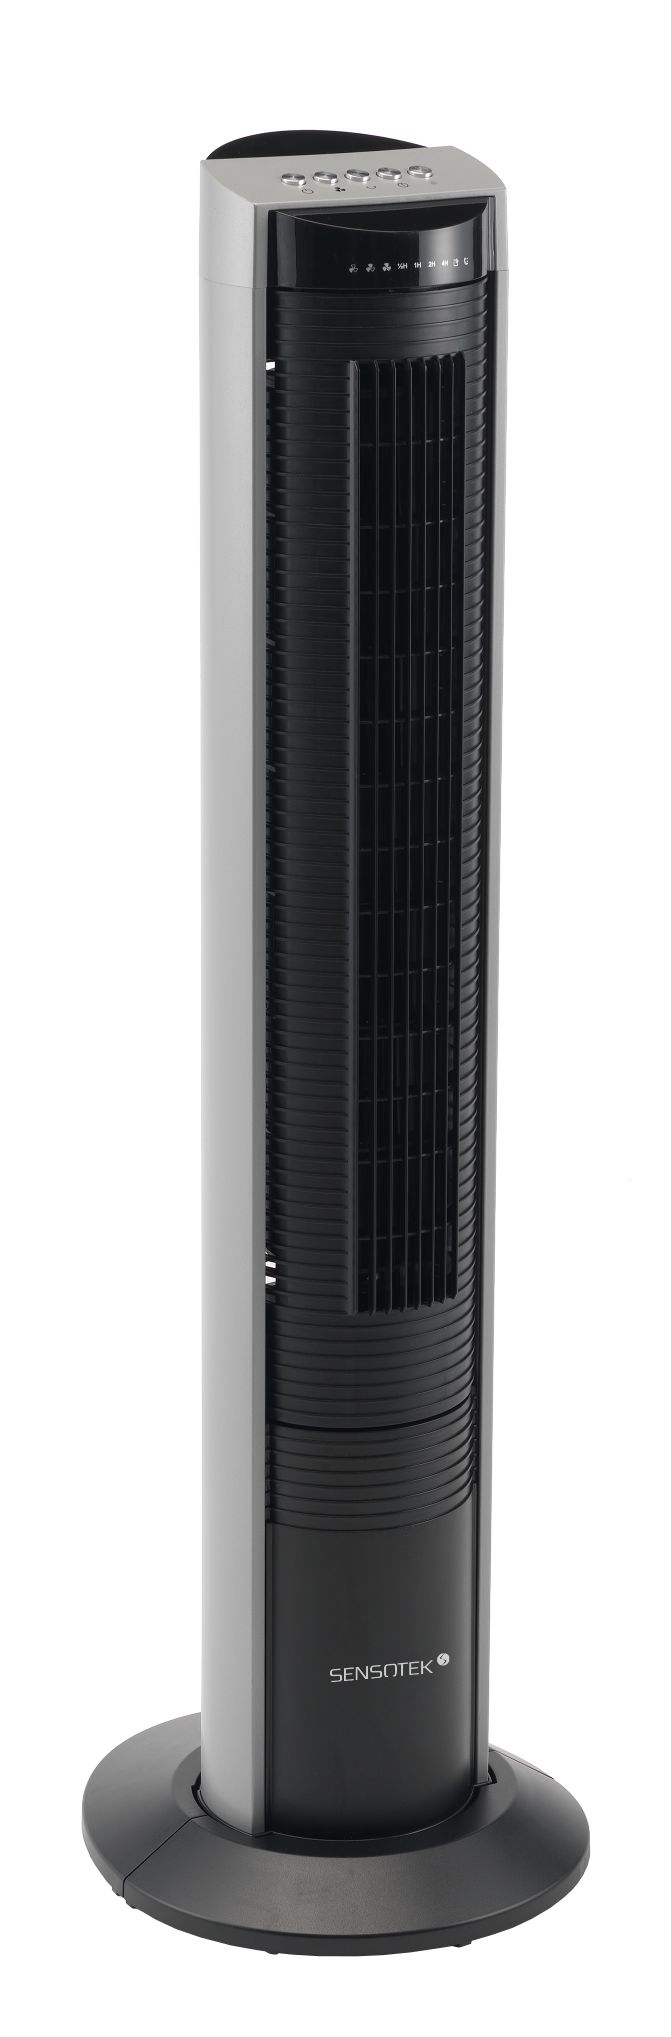 Sensotek ST800 Tower Fan gulvventilator